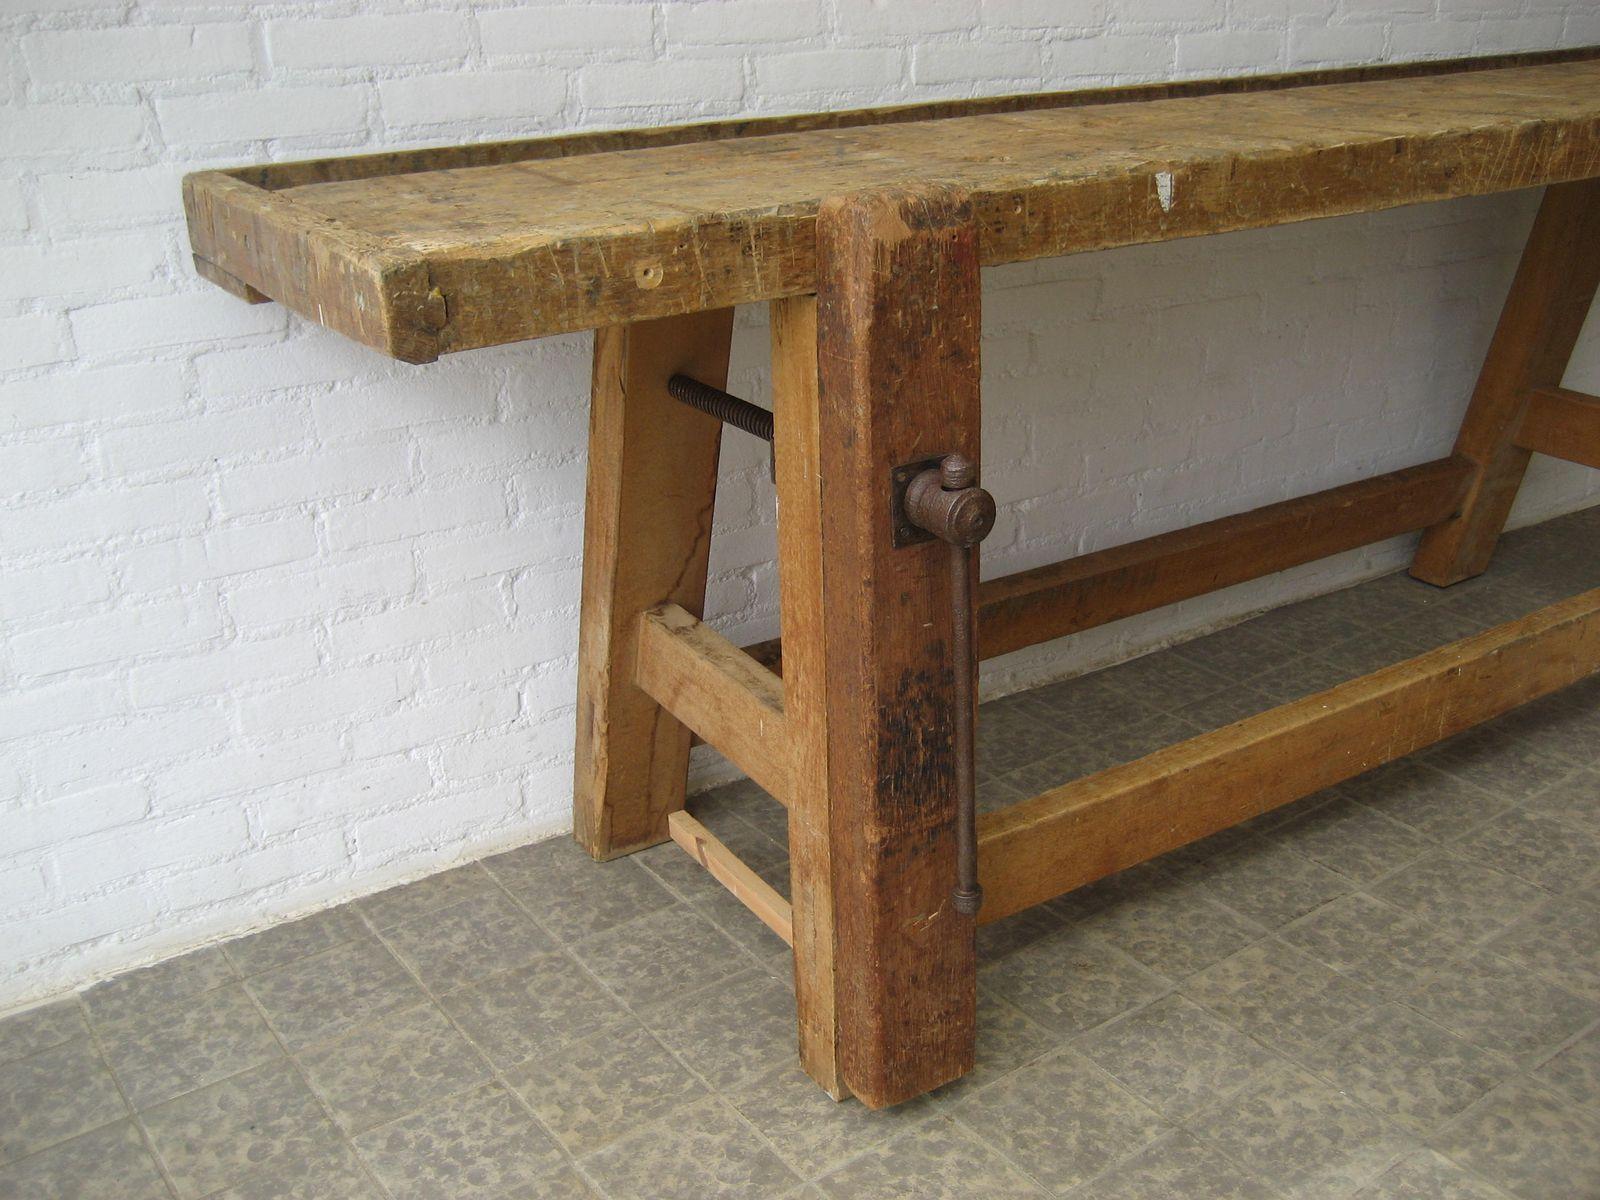 belgische industrielle werkbank mit schraubstock 1950er. Black Bedroom Furniture Sets. Home Design Ideas